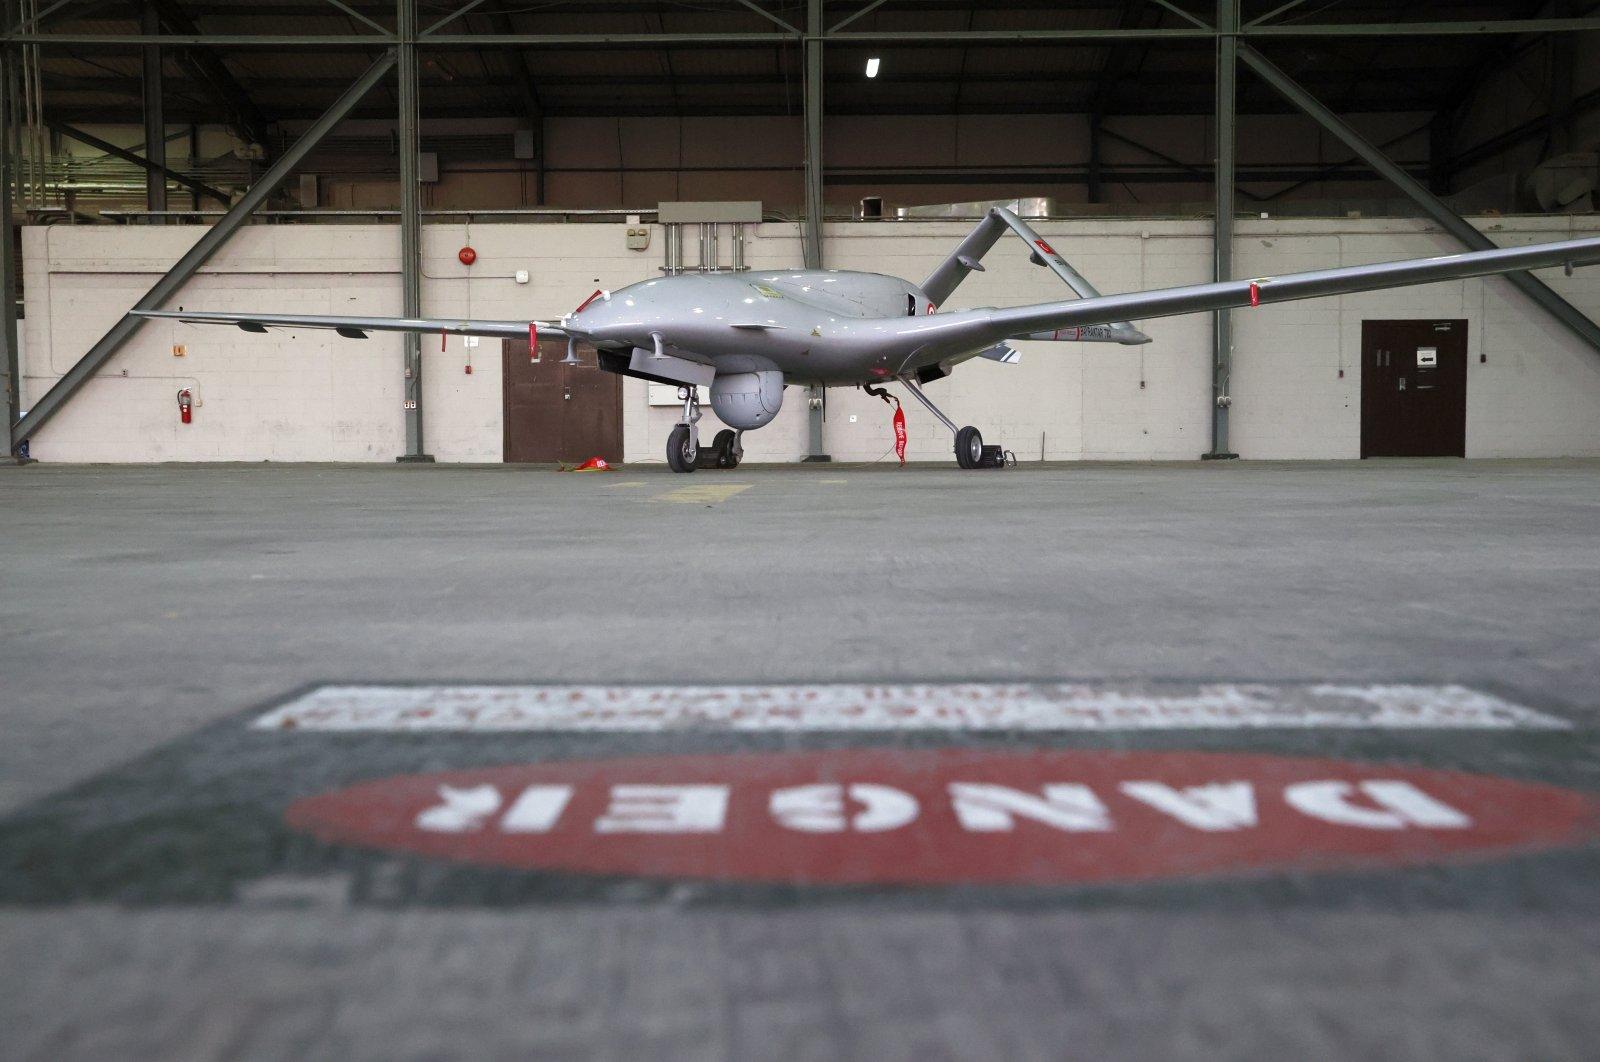 A Turkish Bayraktar TB2 combat drone is seen at the Incirlik airbase, Adana, southern Turkey, May 25, 2021. (EPA Photo)